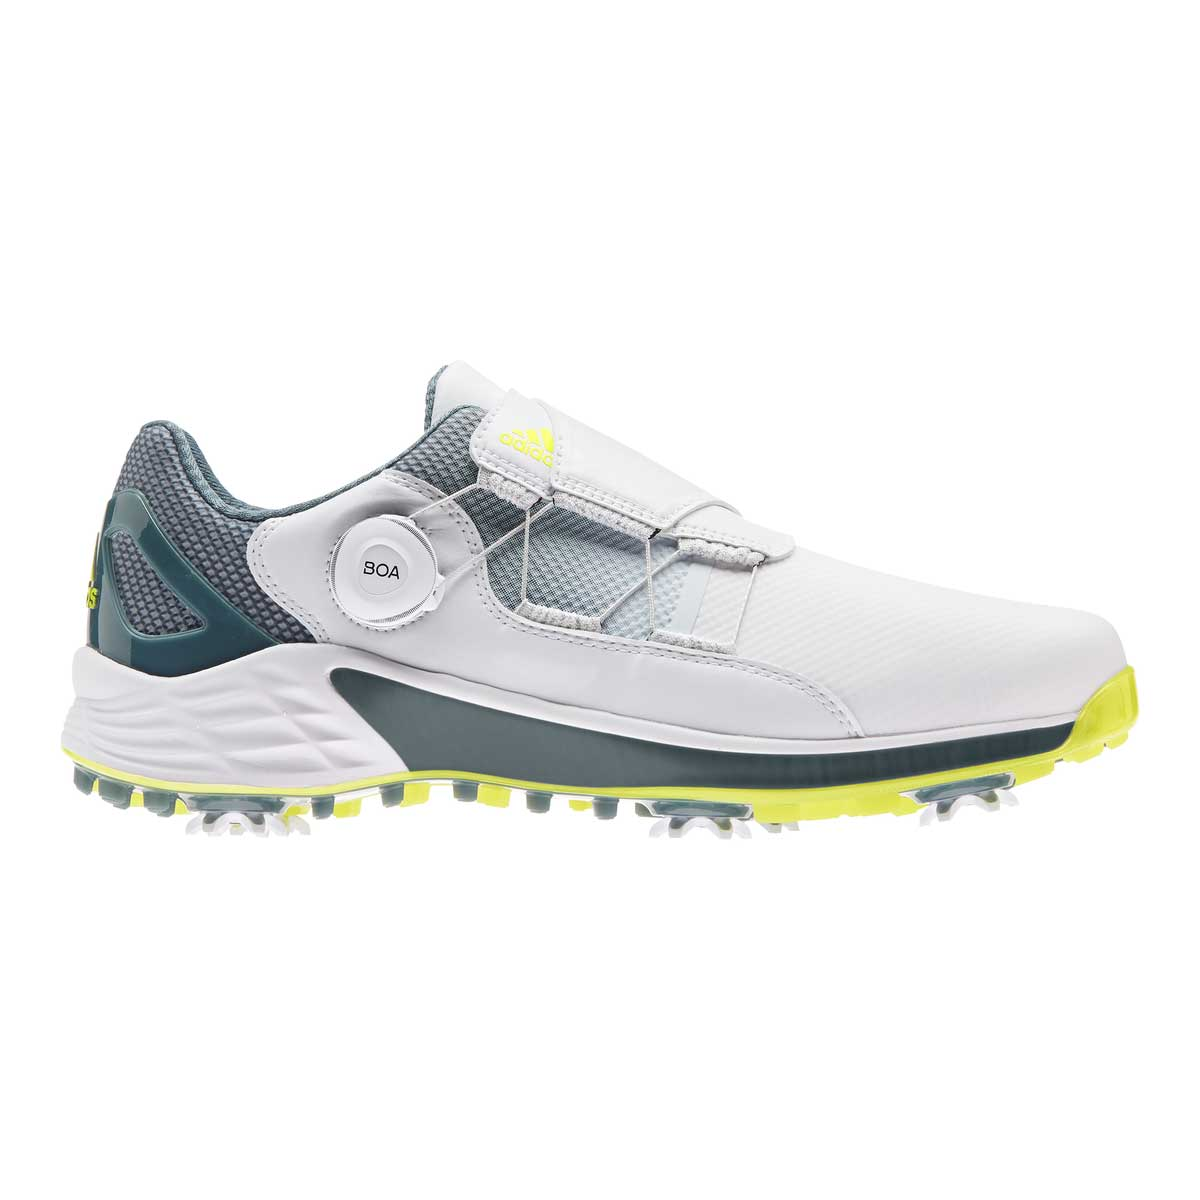 Adidas Men's ZG21 BOA White/Acid Yellow Golf Shoe